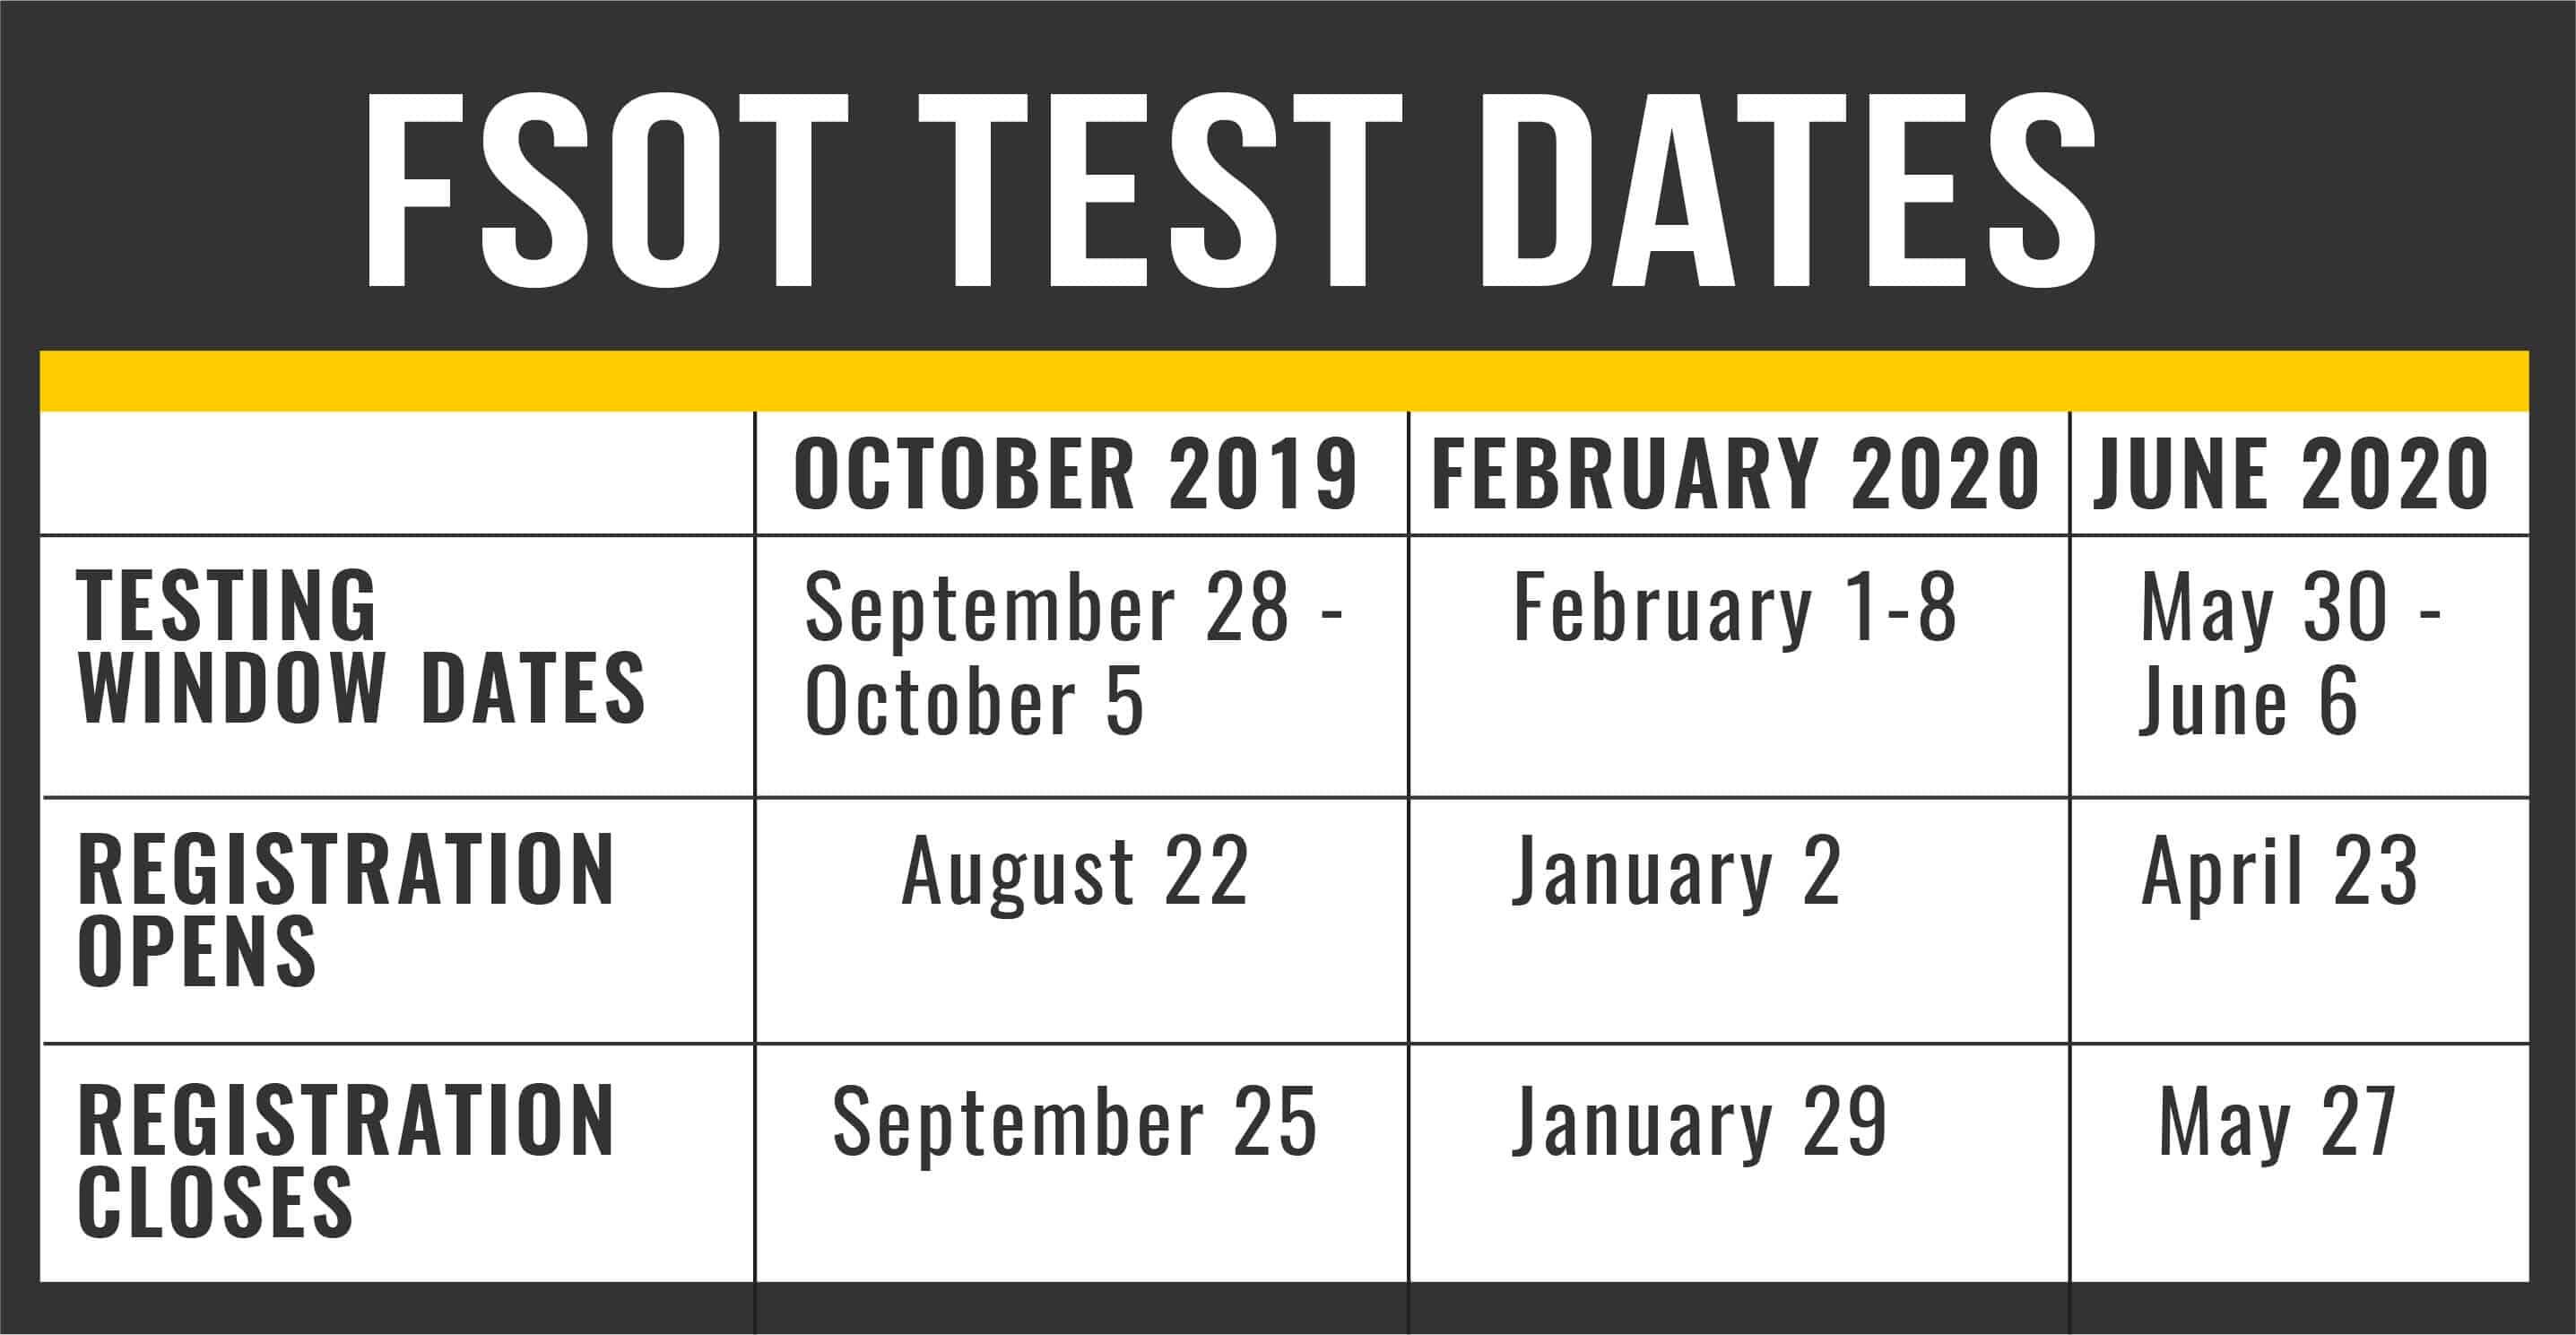 FSOT Test Dates